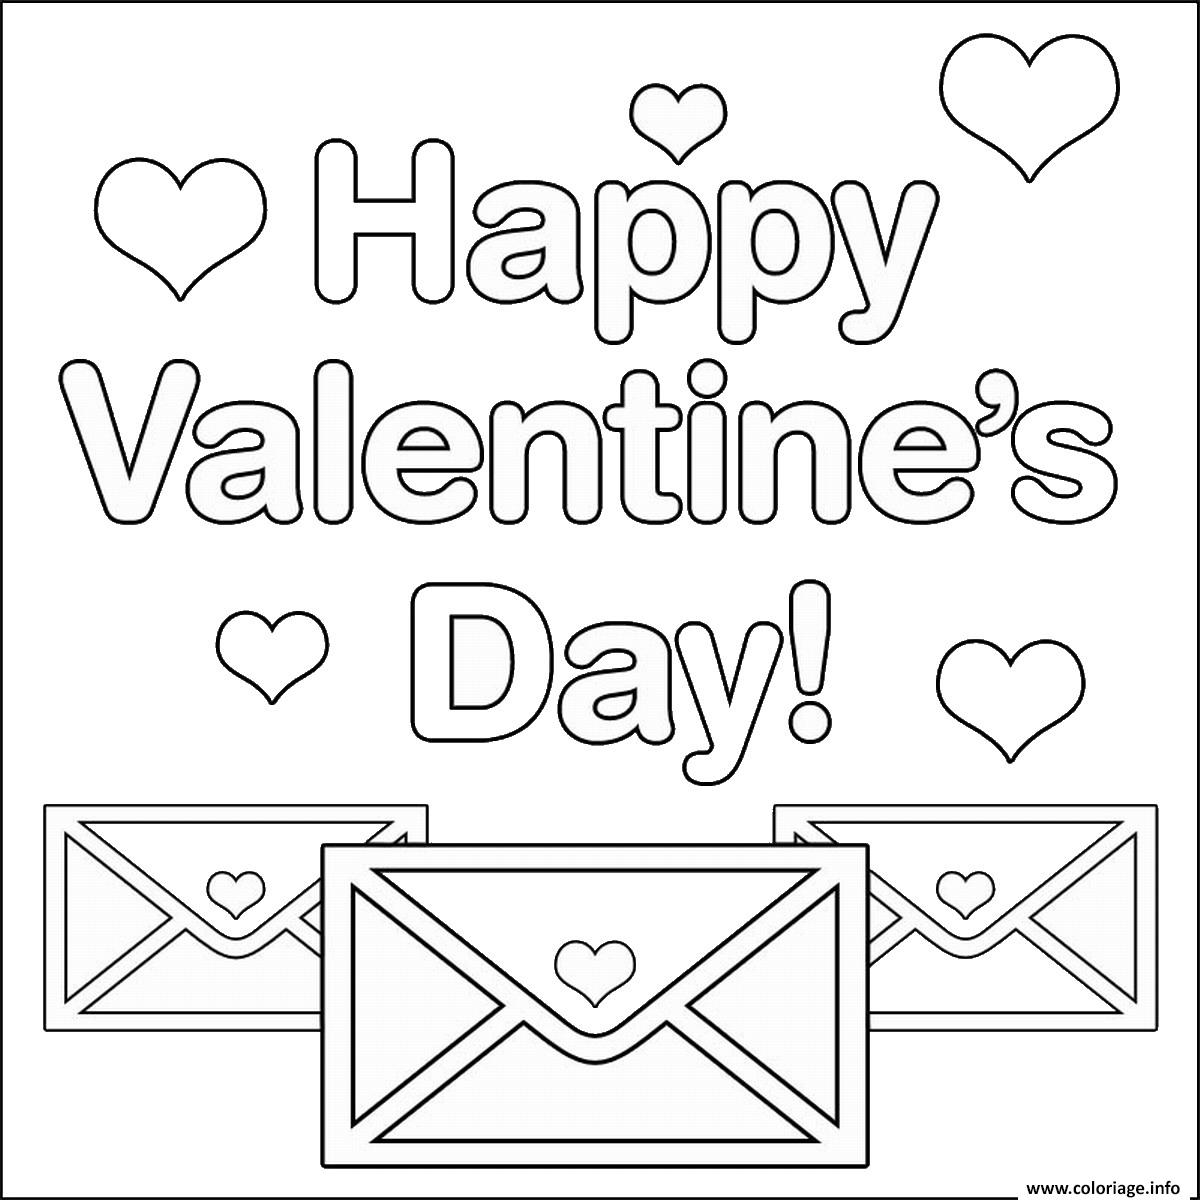 Dessin happy valentines day letters with hearts Coloriage Gratuit à Imprimer